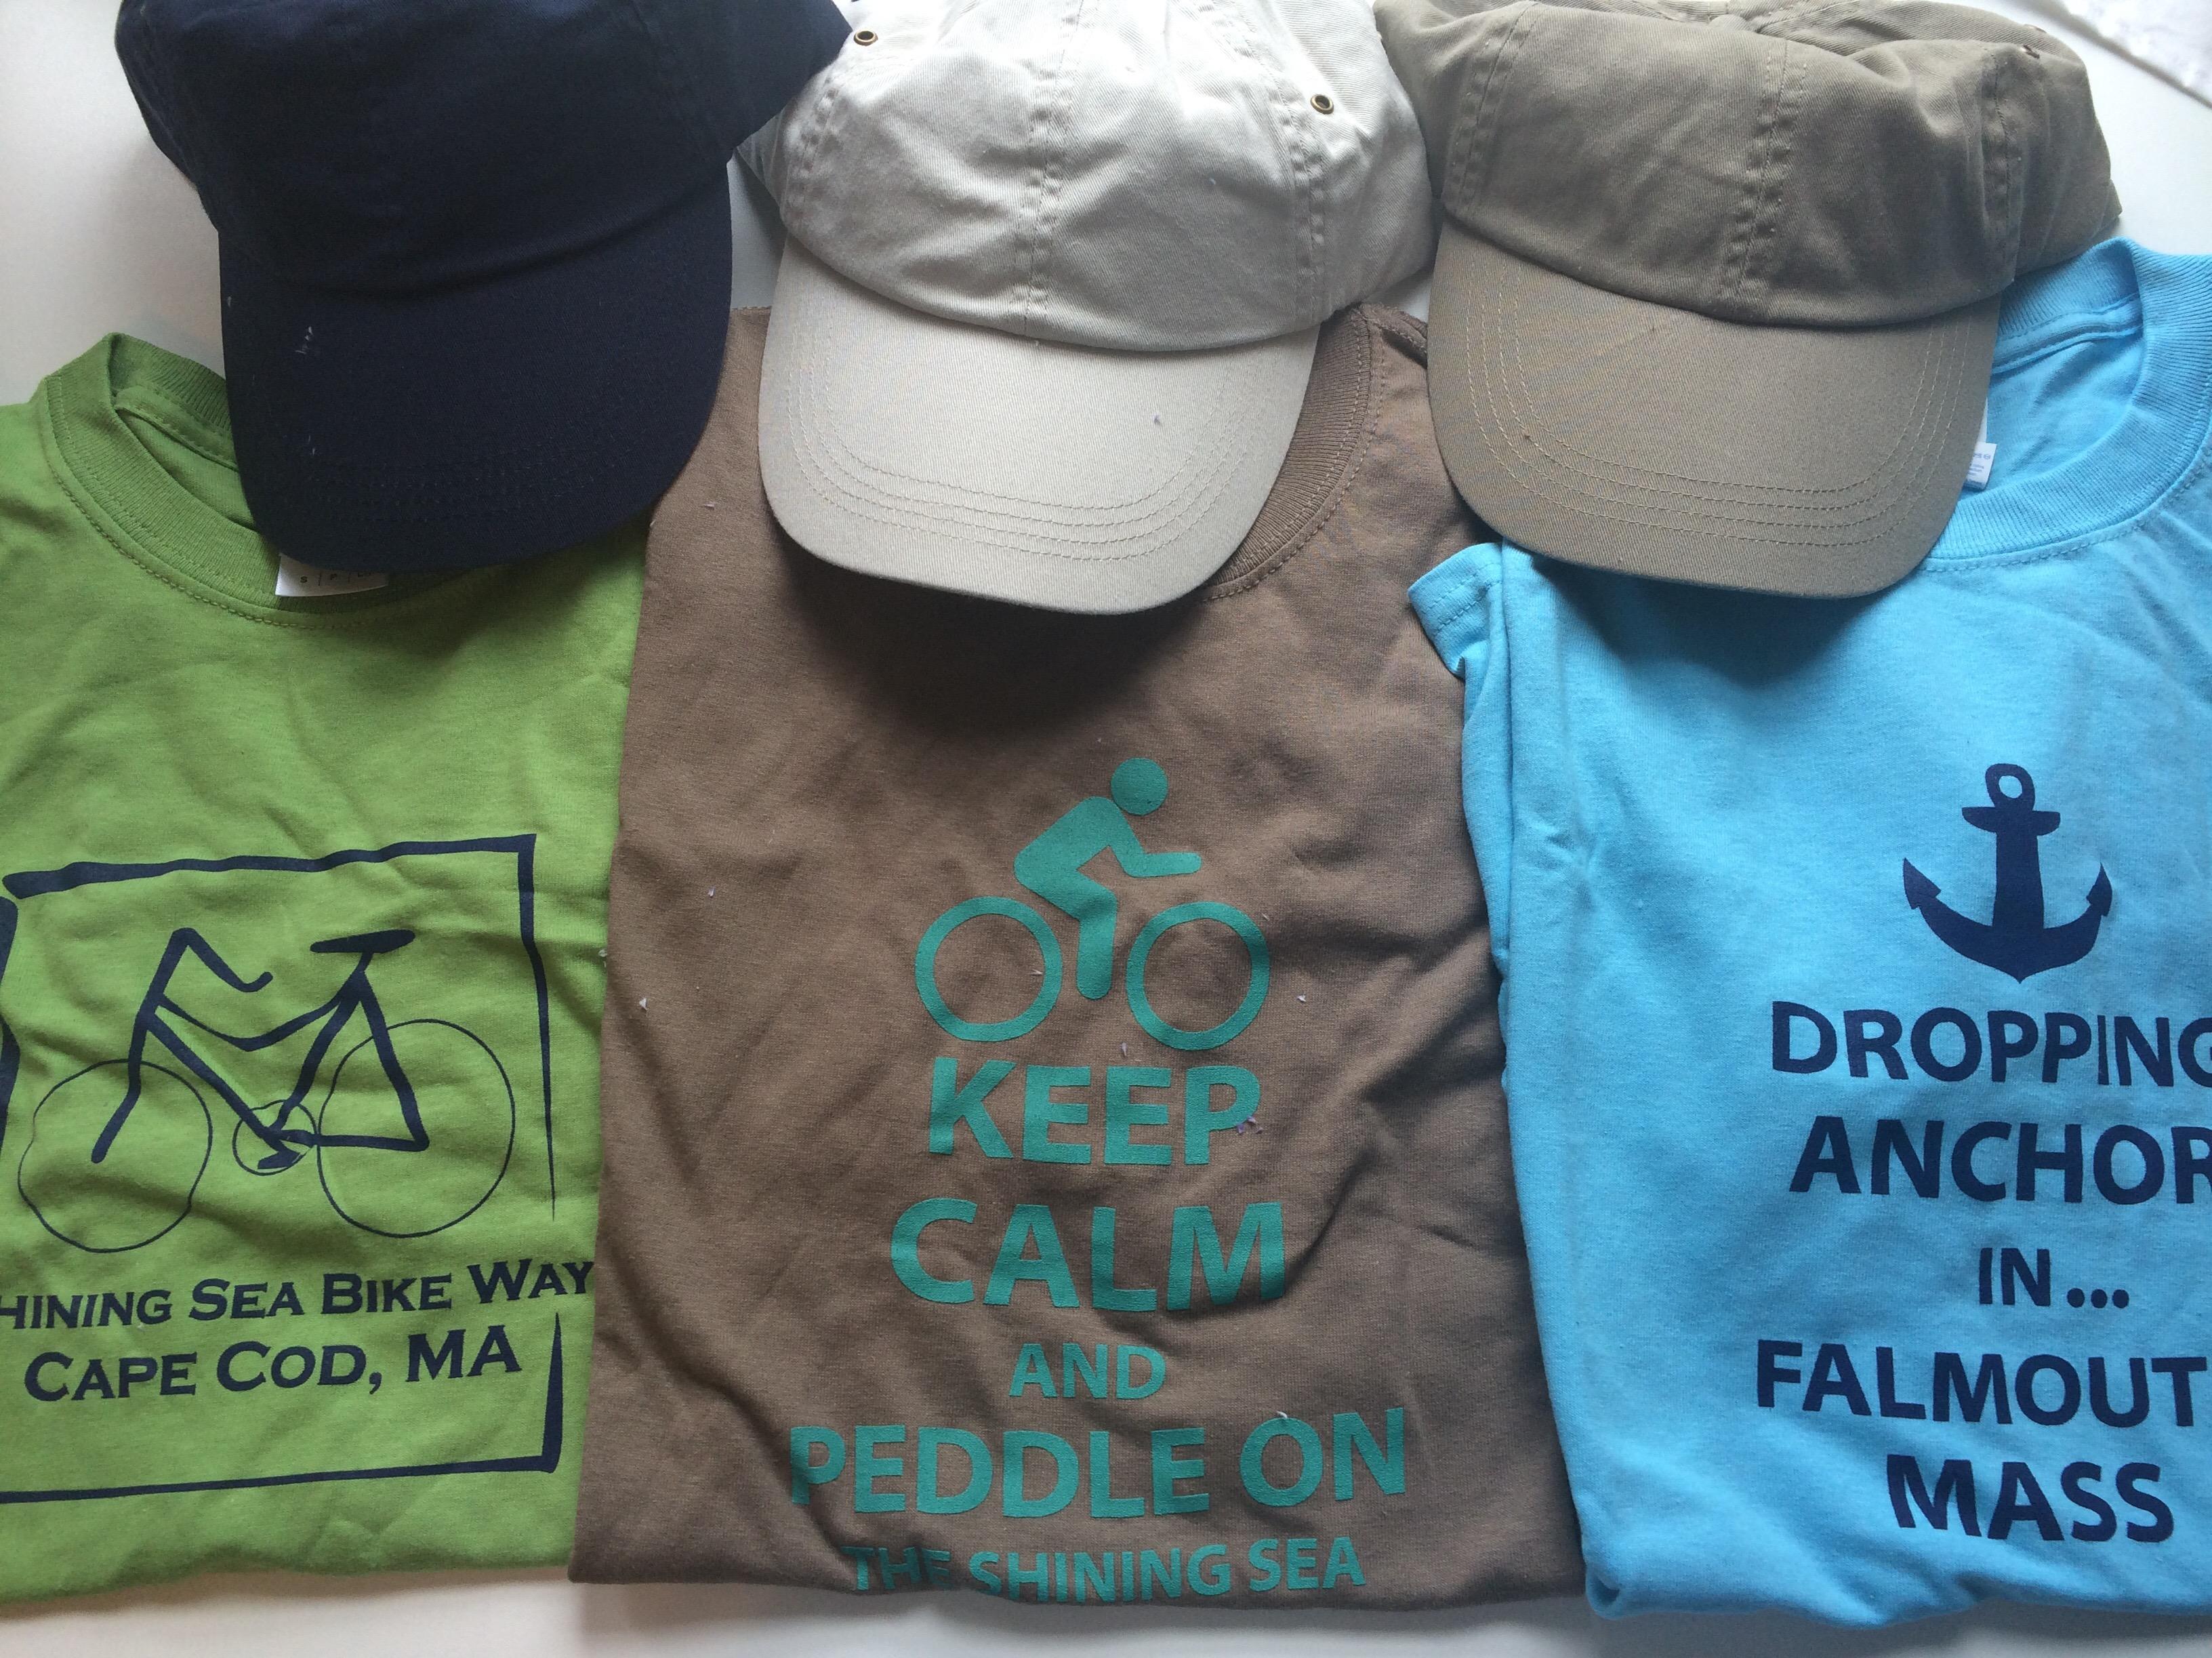 Bikeway T-Shirts